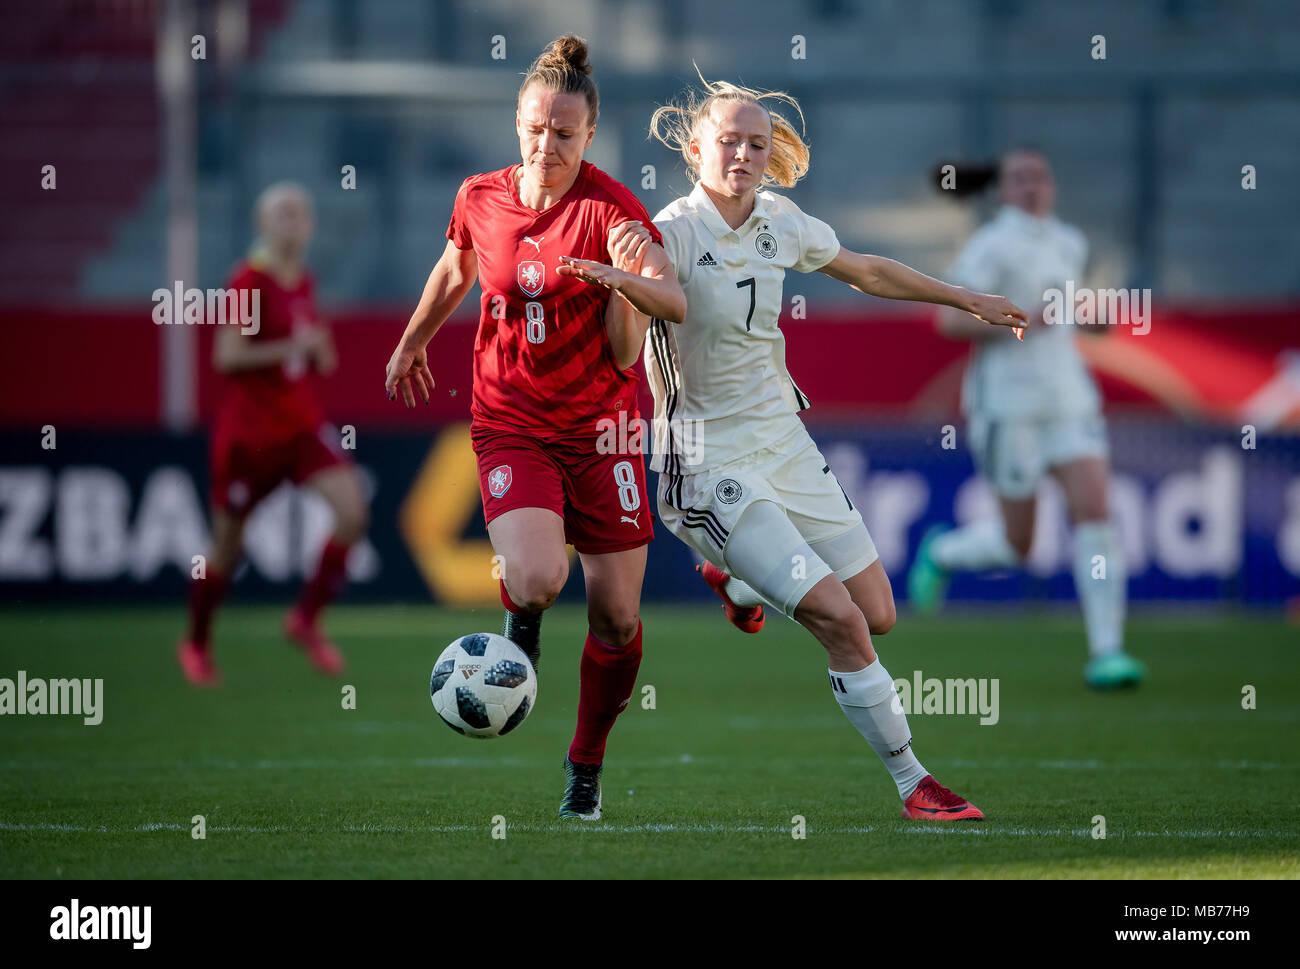 Lea Schueller Germany Versus Jana Sedlackova Tschechien